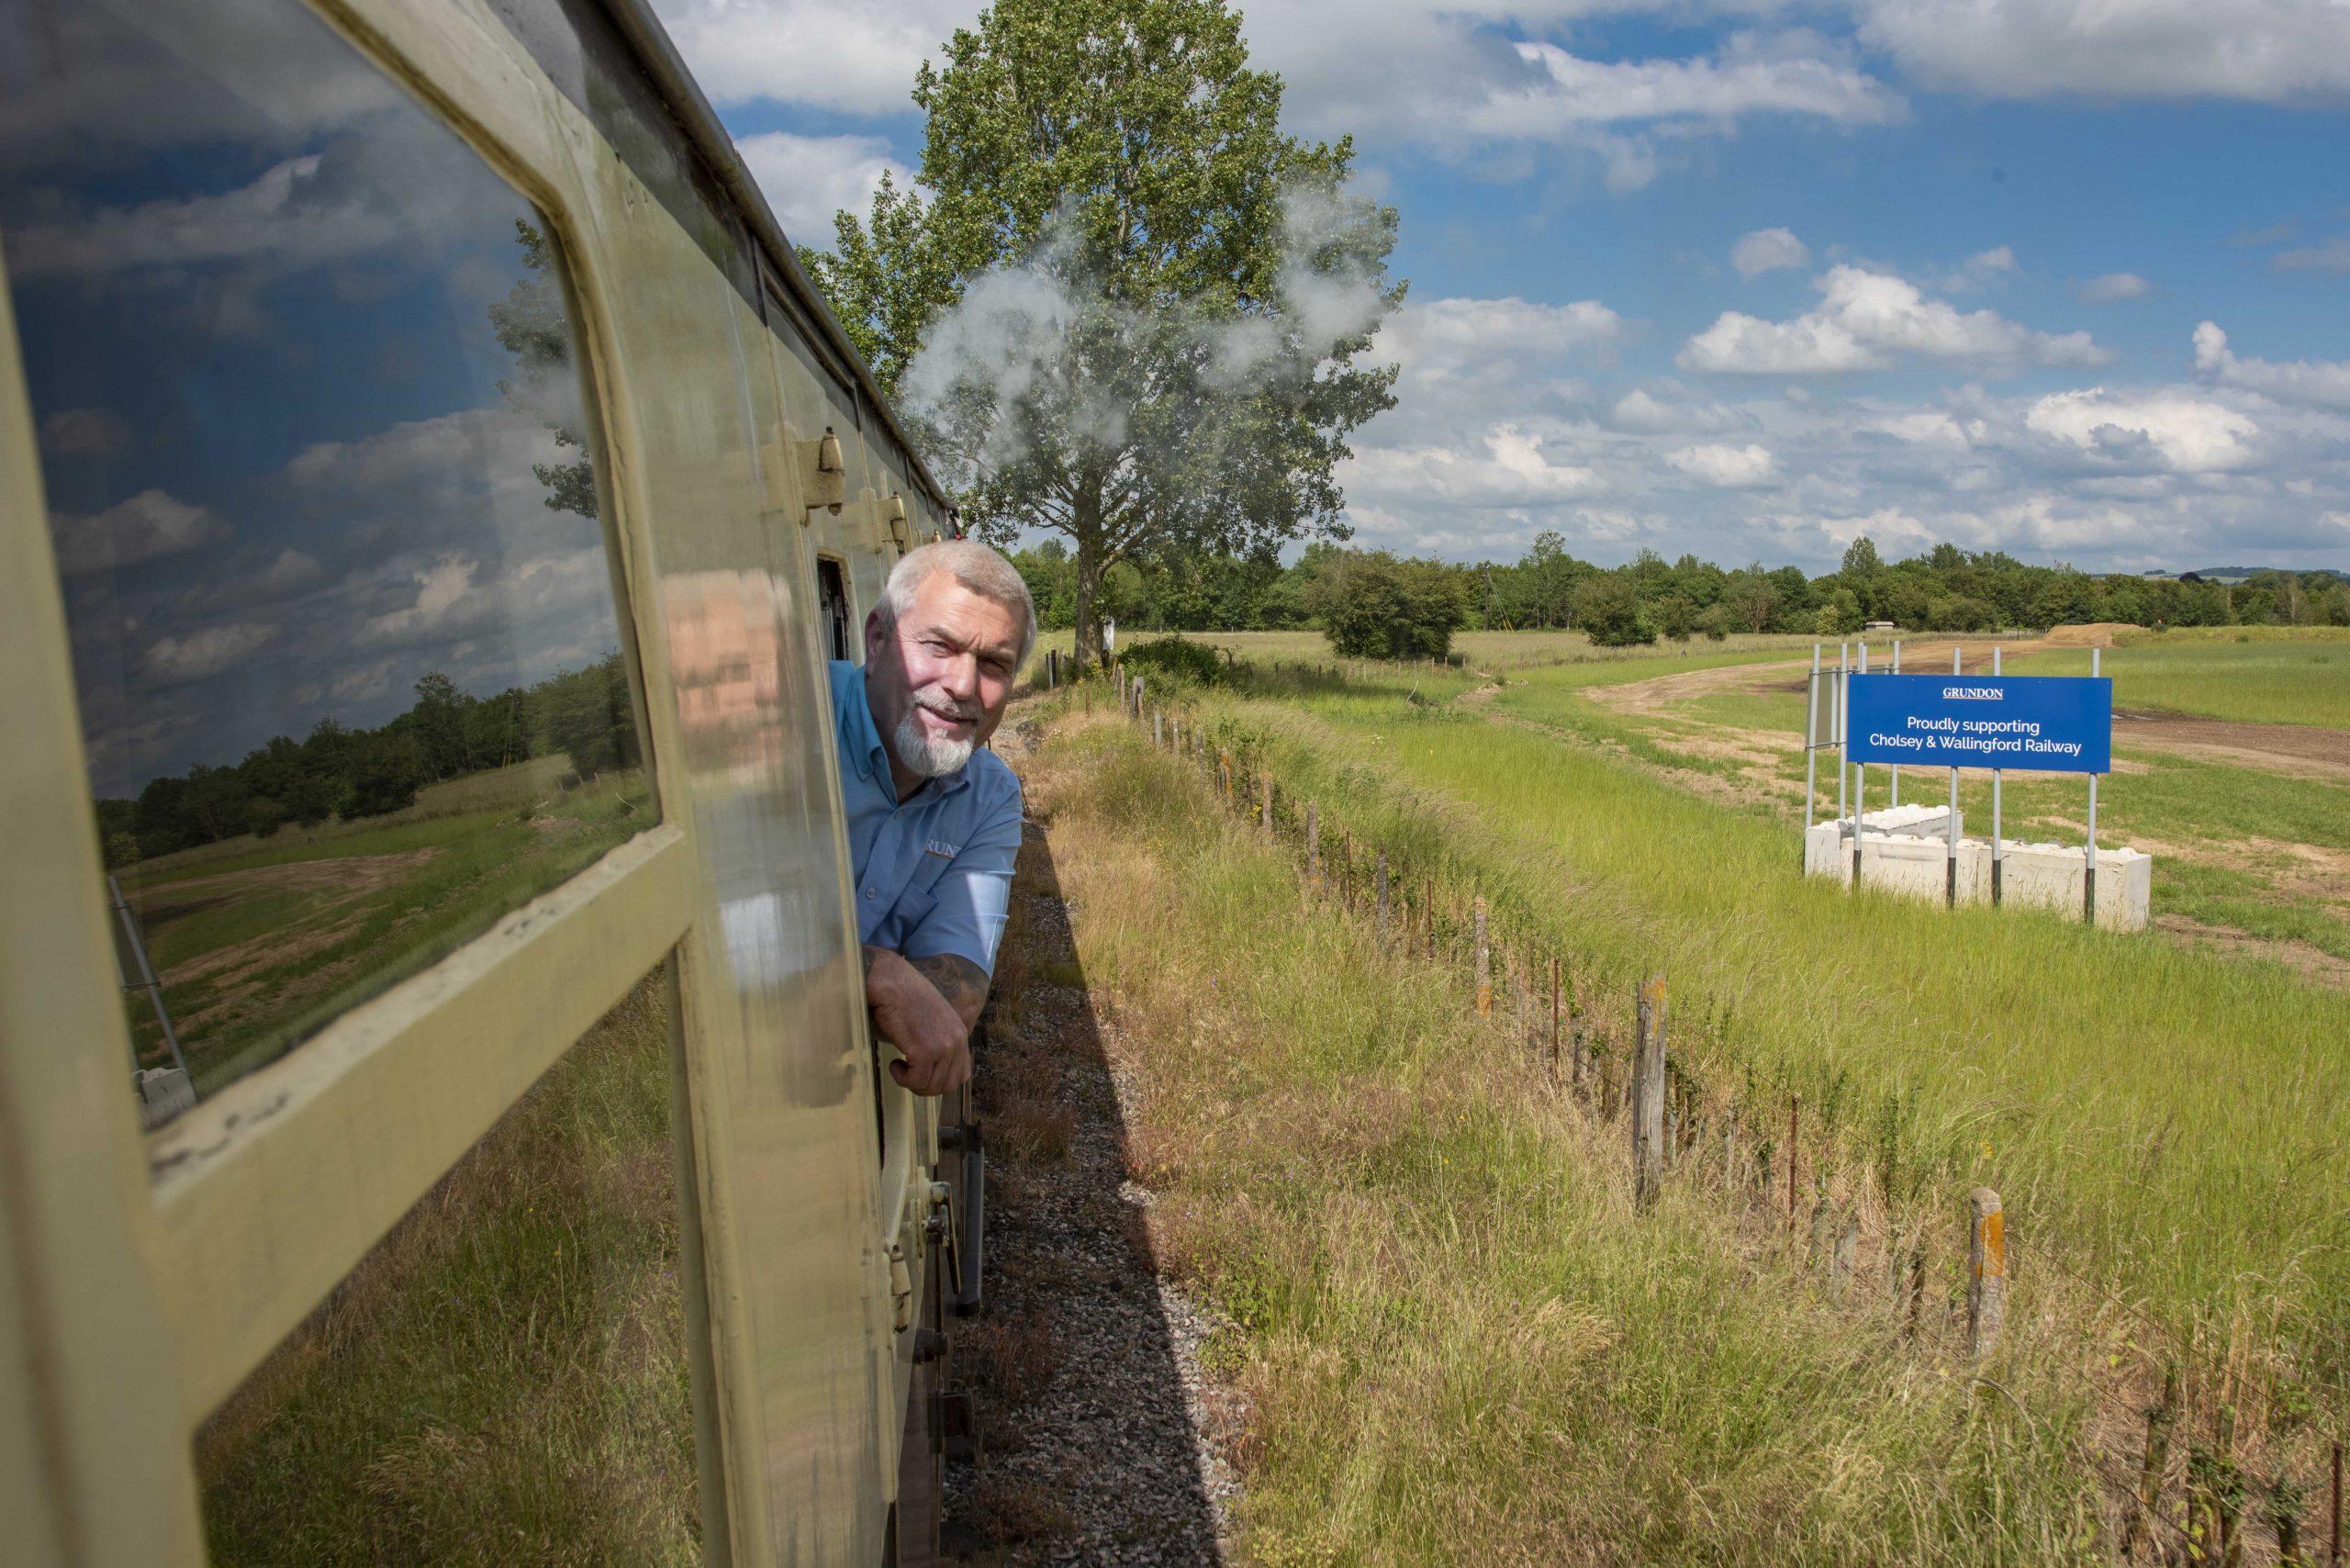 Peter Kent enjoys the view as the train steams post Grundon's New Barn Farm quarry, near Cholsey.